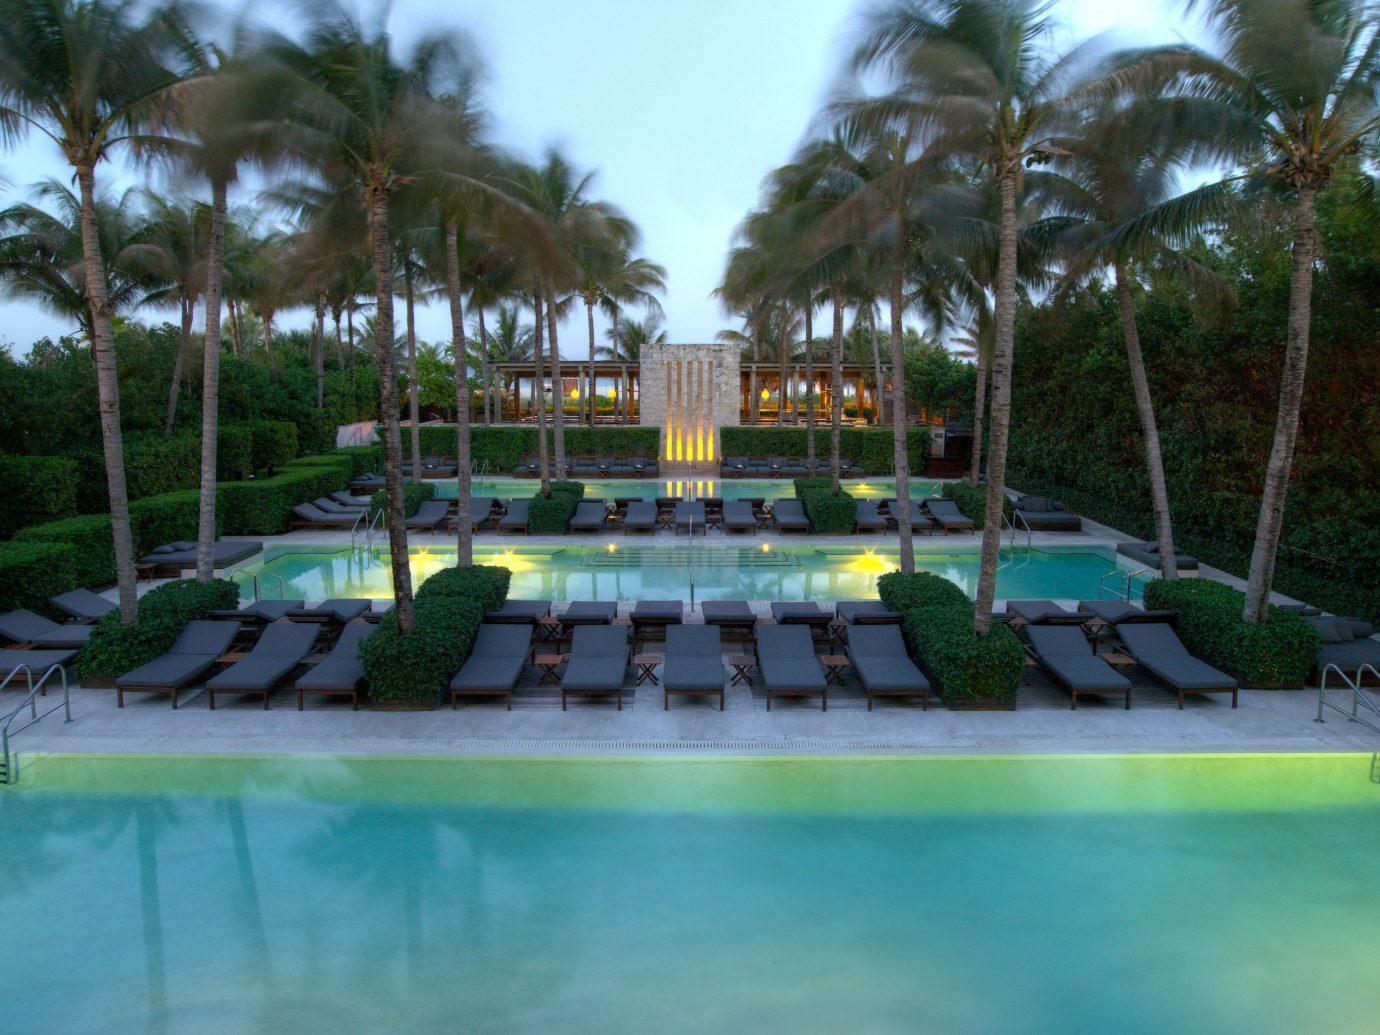 Lounge Luxury Modern Pool Trip Ideas tree outdoor leisure swimming pool Resort Water park amusement park estate sport venue park condominium arecales